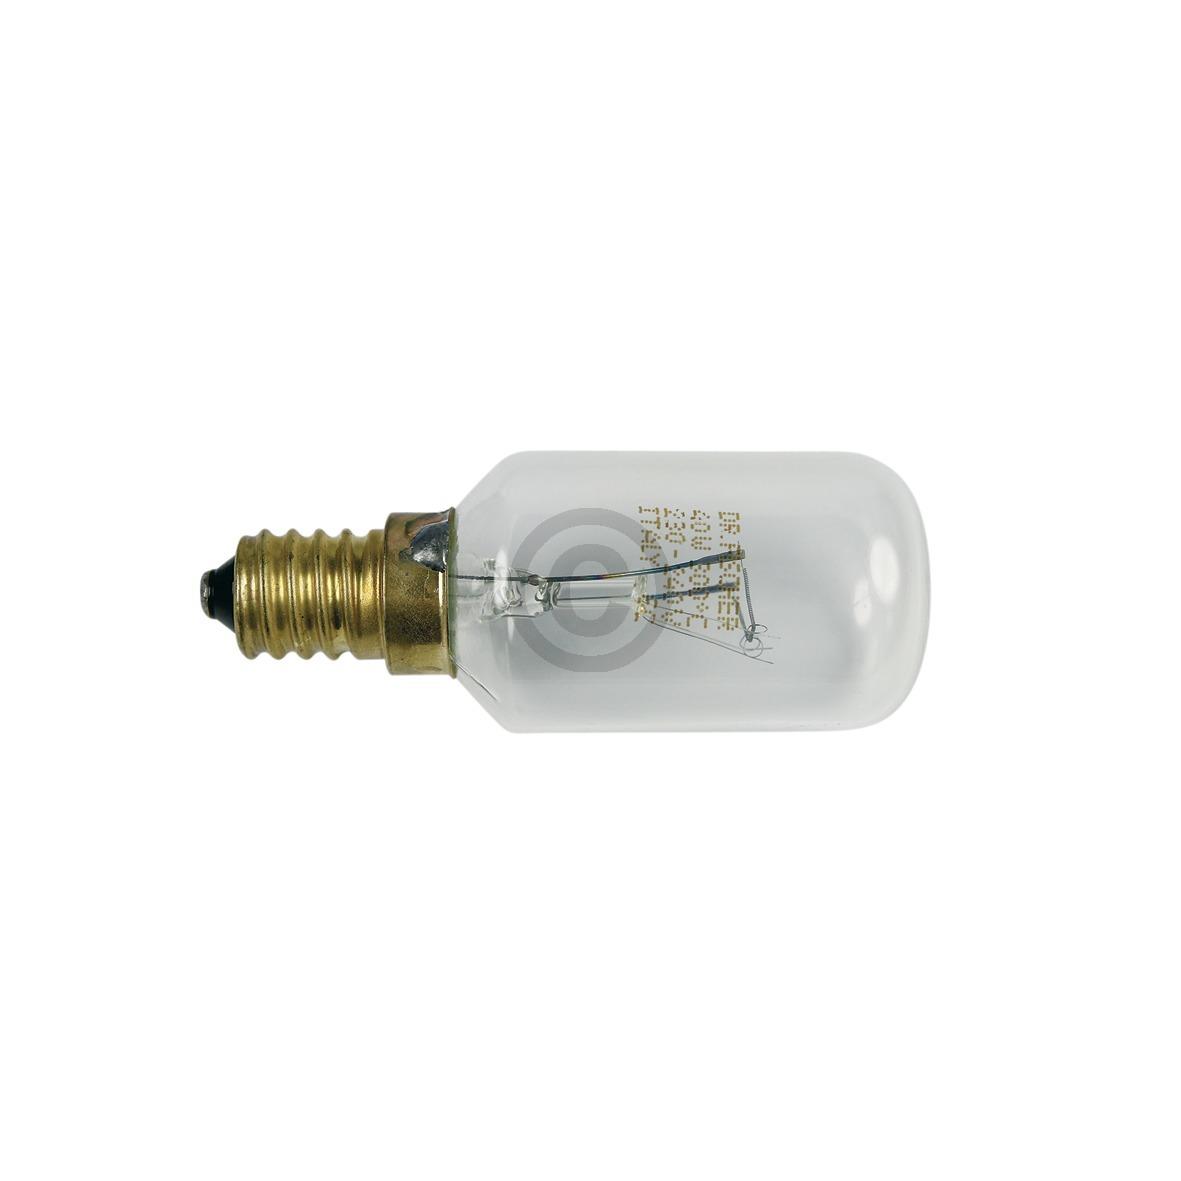 Lampe E14 40W 29mmØ 76mm 230/240V AEG 319256007/0 Original für Backofen